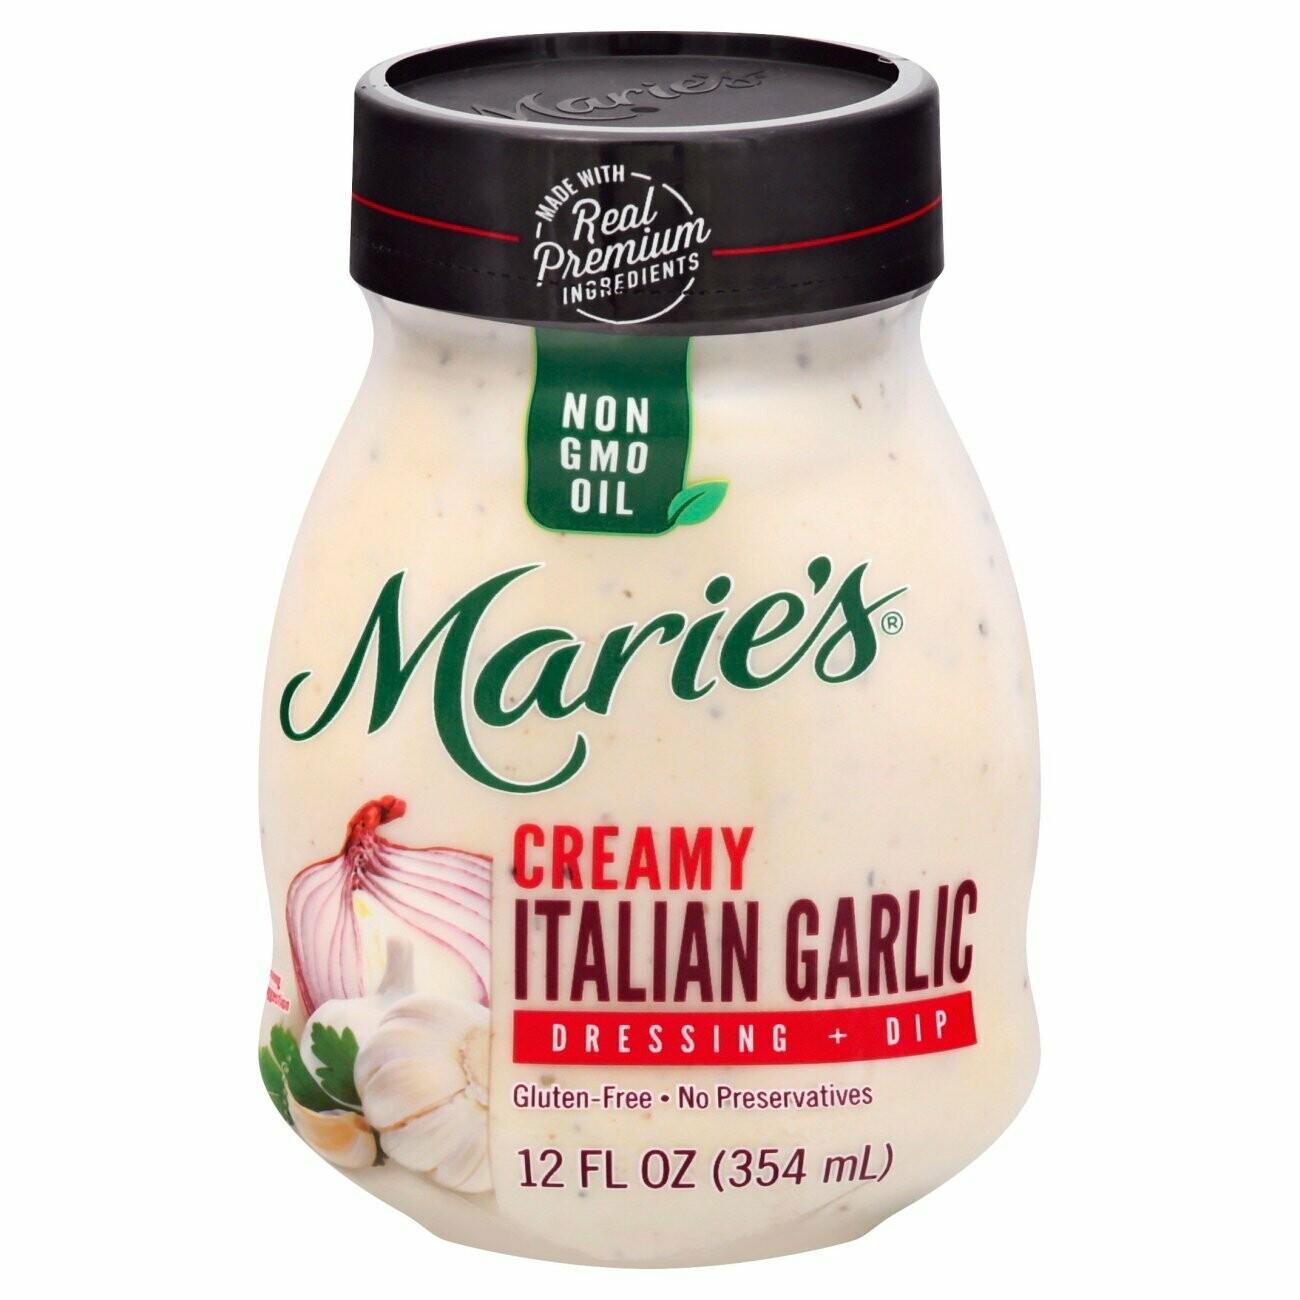 Marie's Creamy Italian Garlic Dressing + Dip 12oz